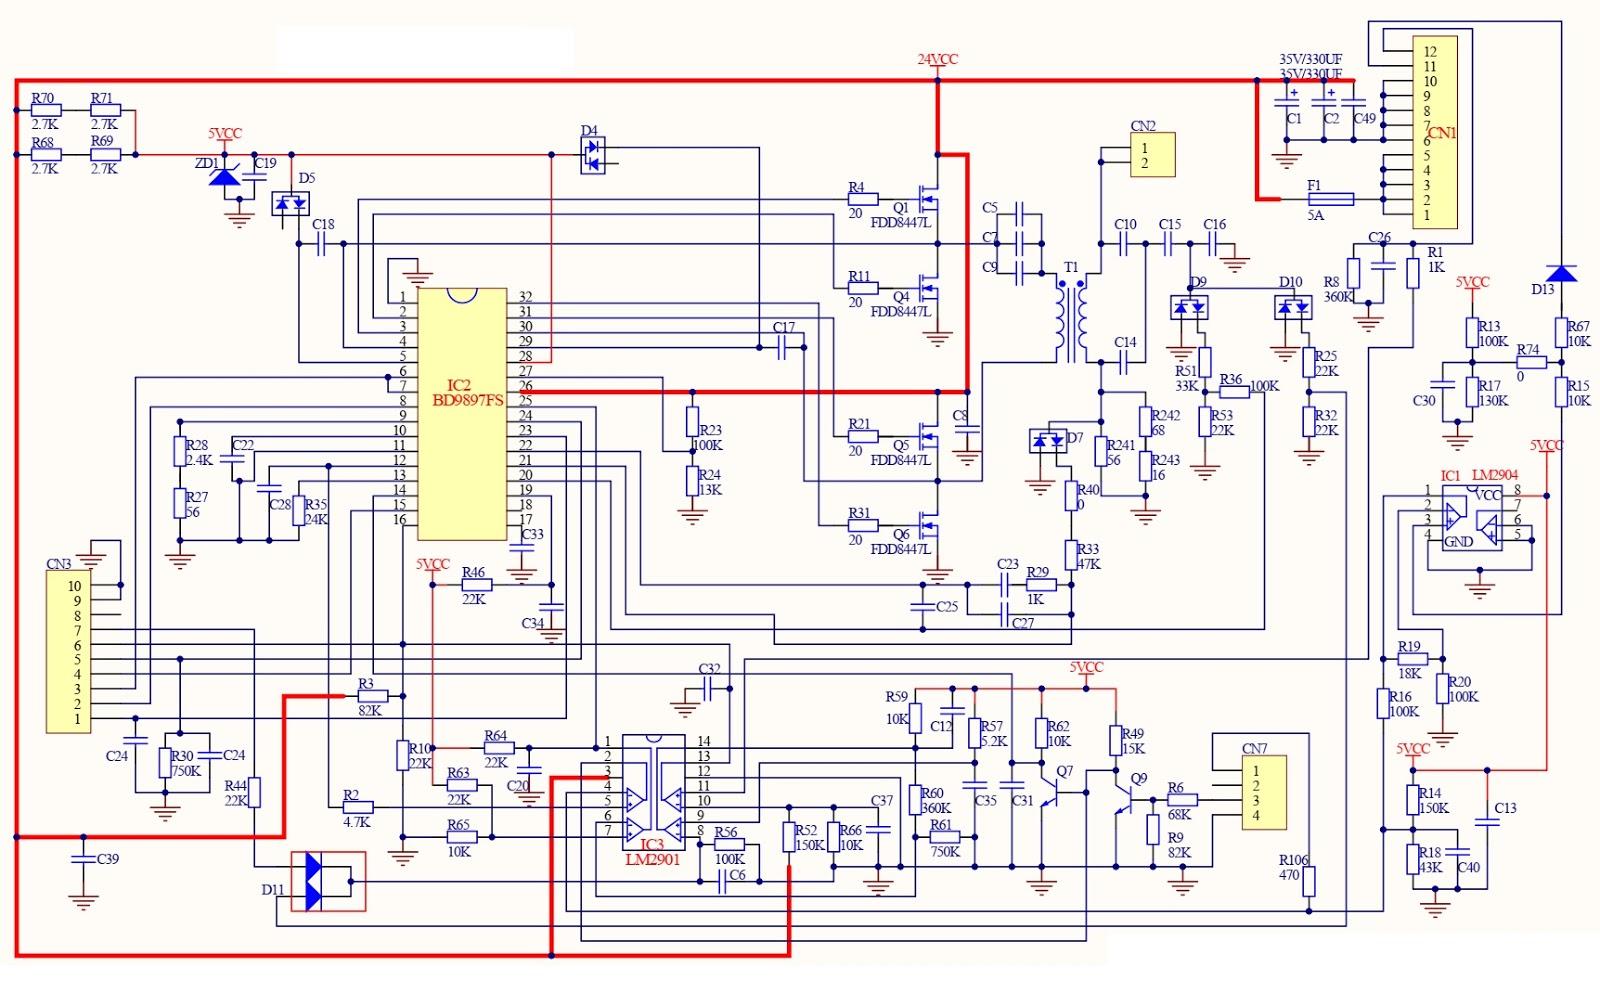 Schematic Diagrams  Vizio  Lg And Tcl Lcd Tv Smps Schematics